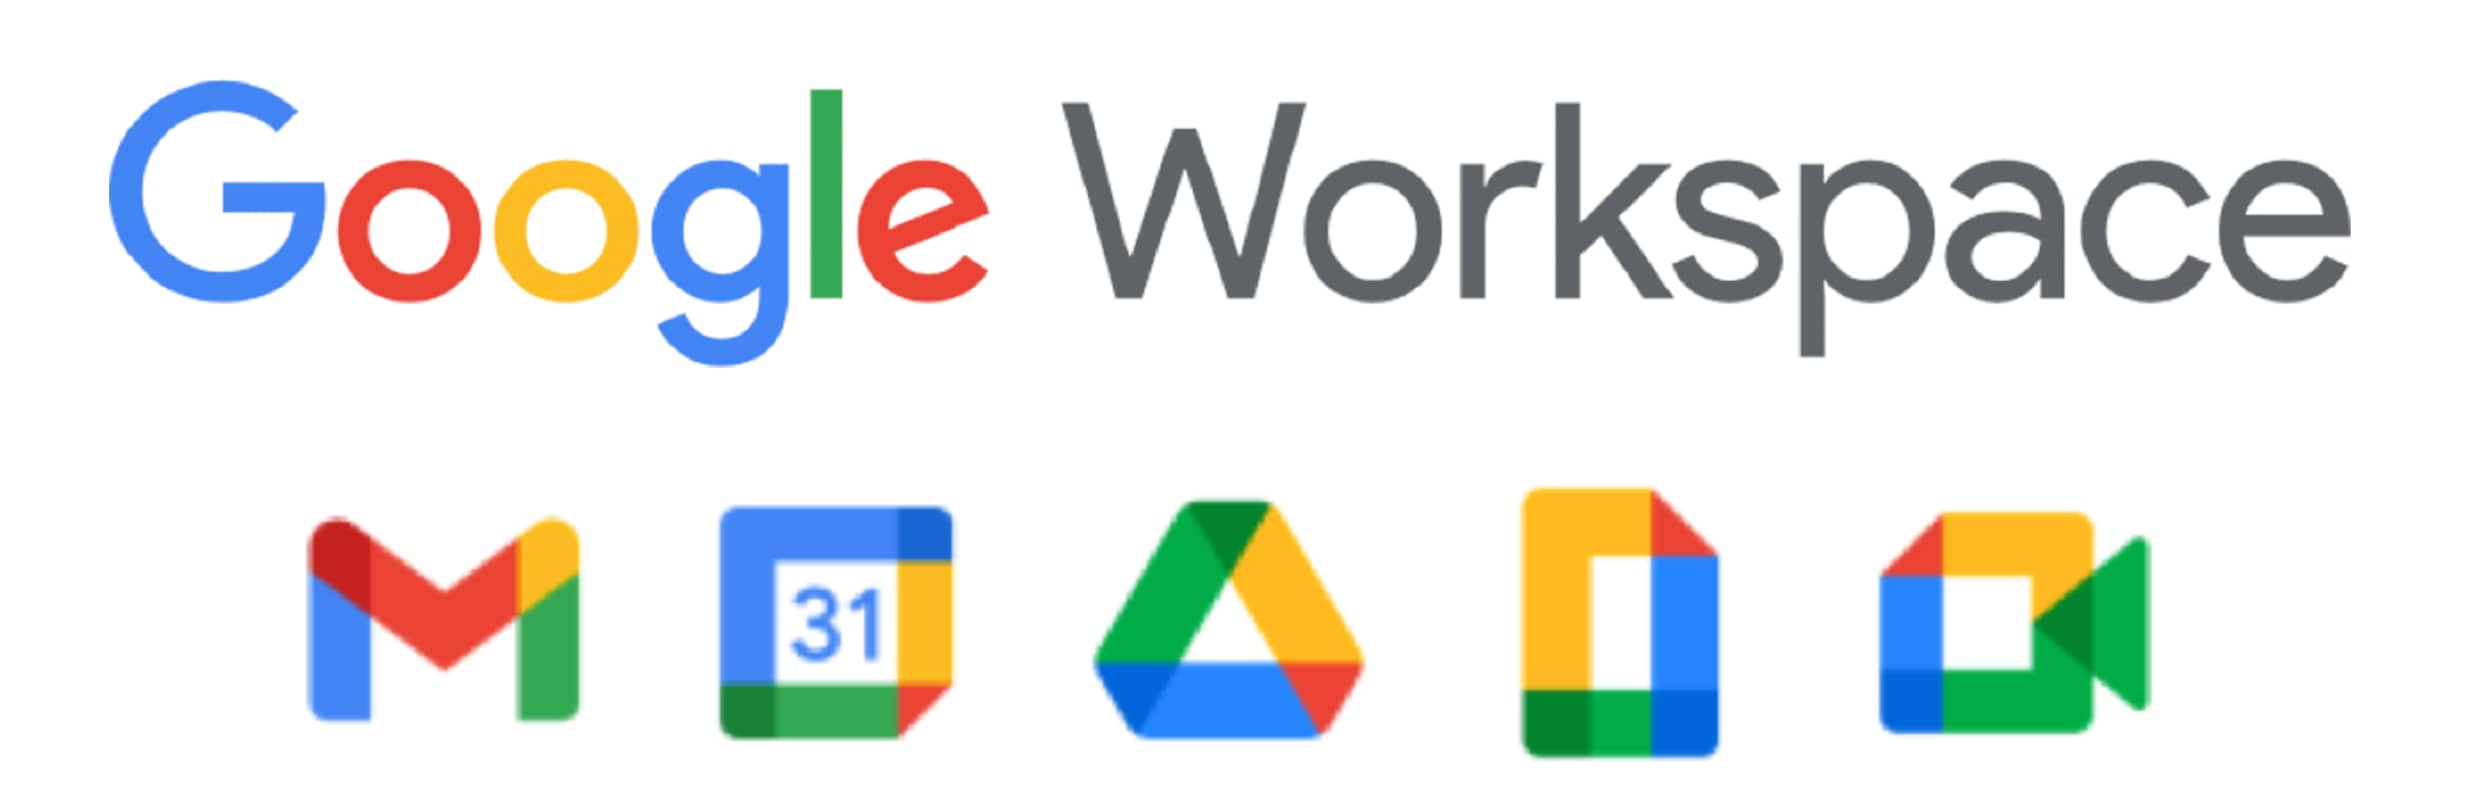 google workspace logo cloud